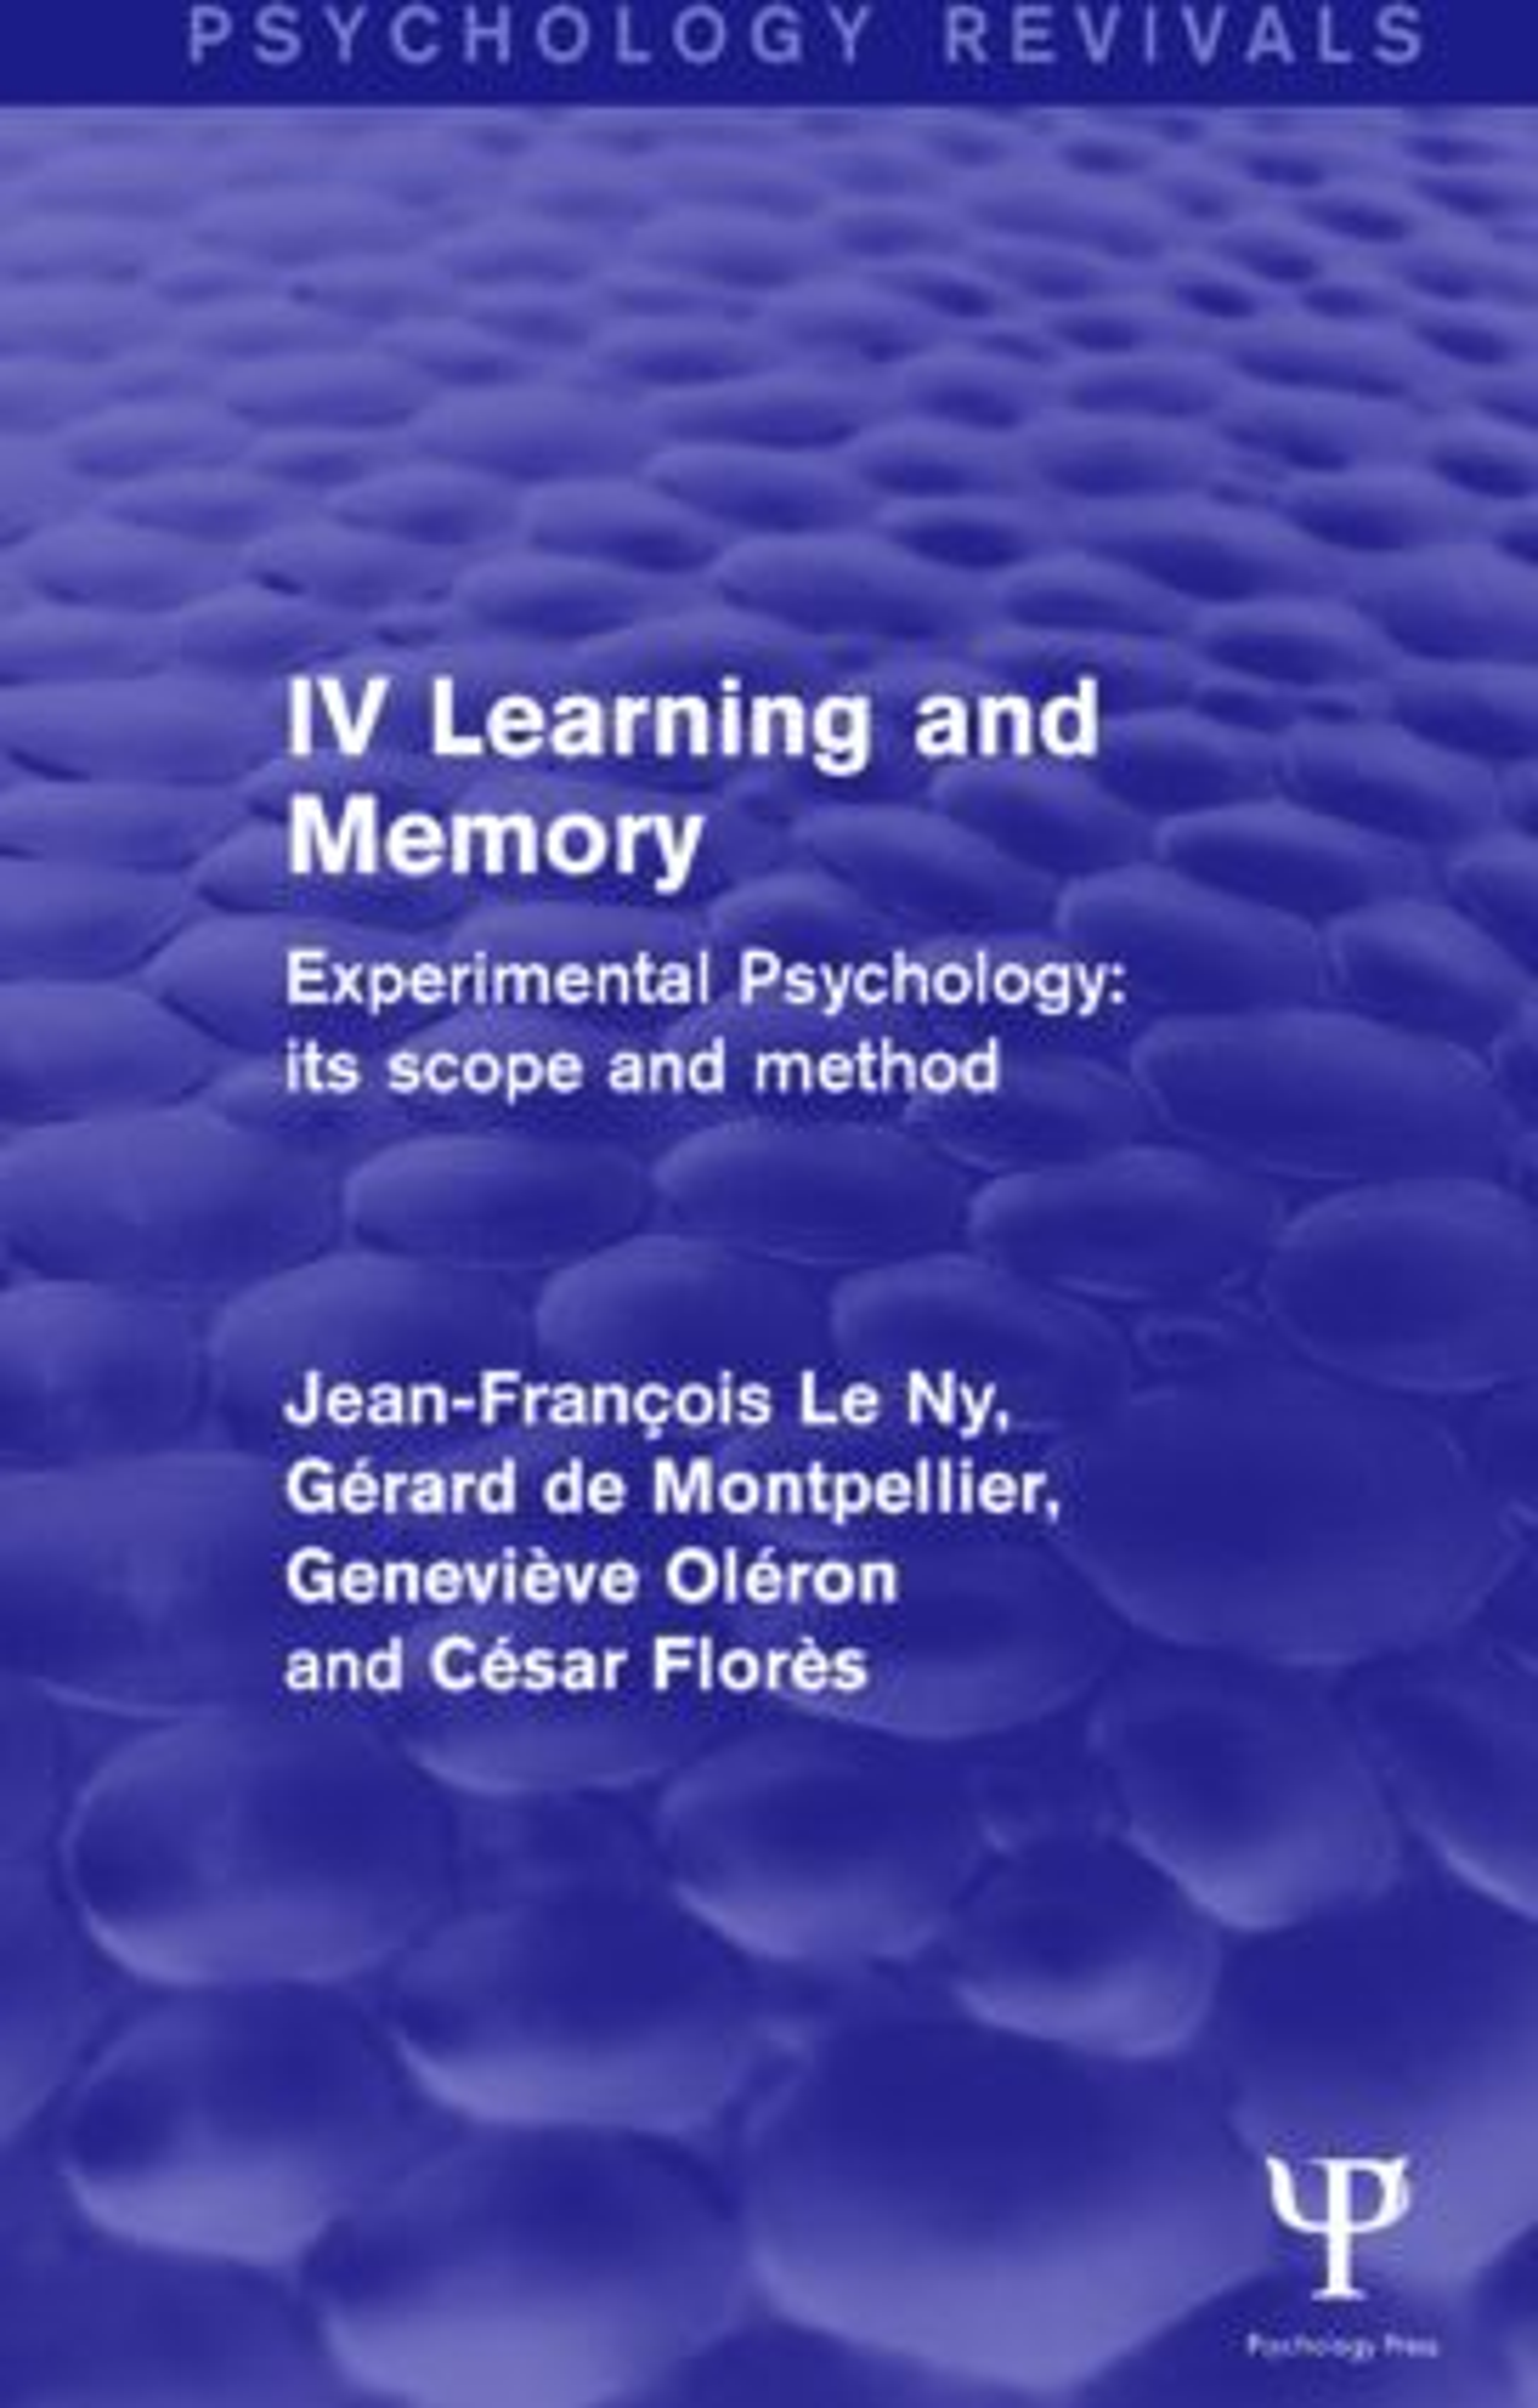 Experimental Psychology Its Scope and Method: Volume IV (Psychology Revivals)